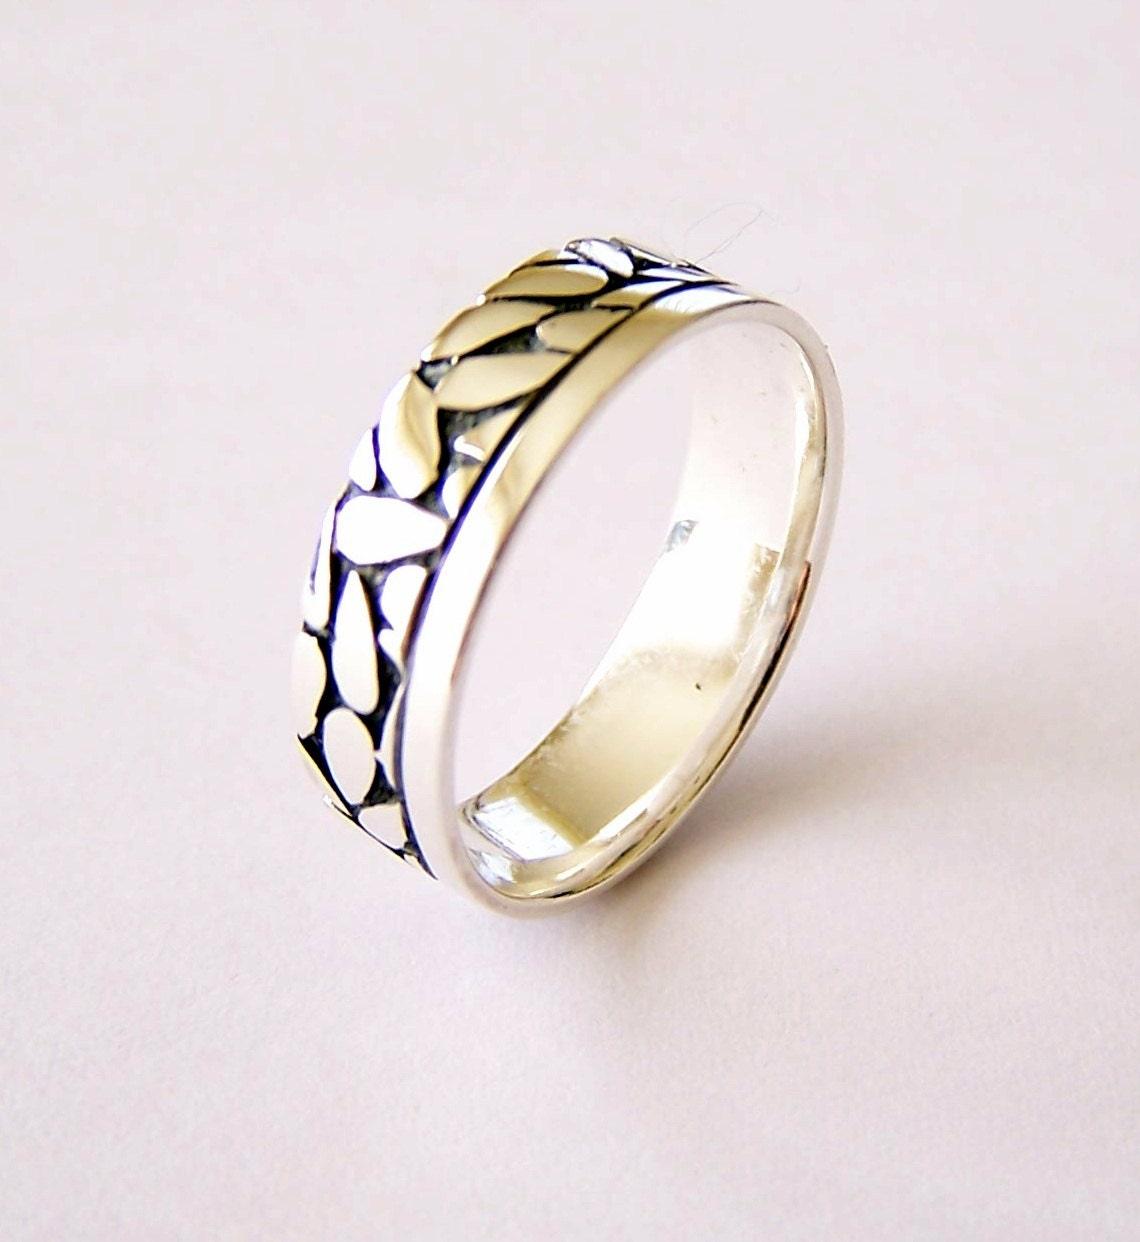 promise rings for men with leaves rings for men for. Black Bedroom Furniture Sets. Home Design Ideas